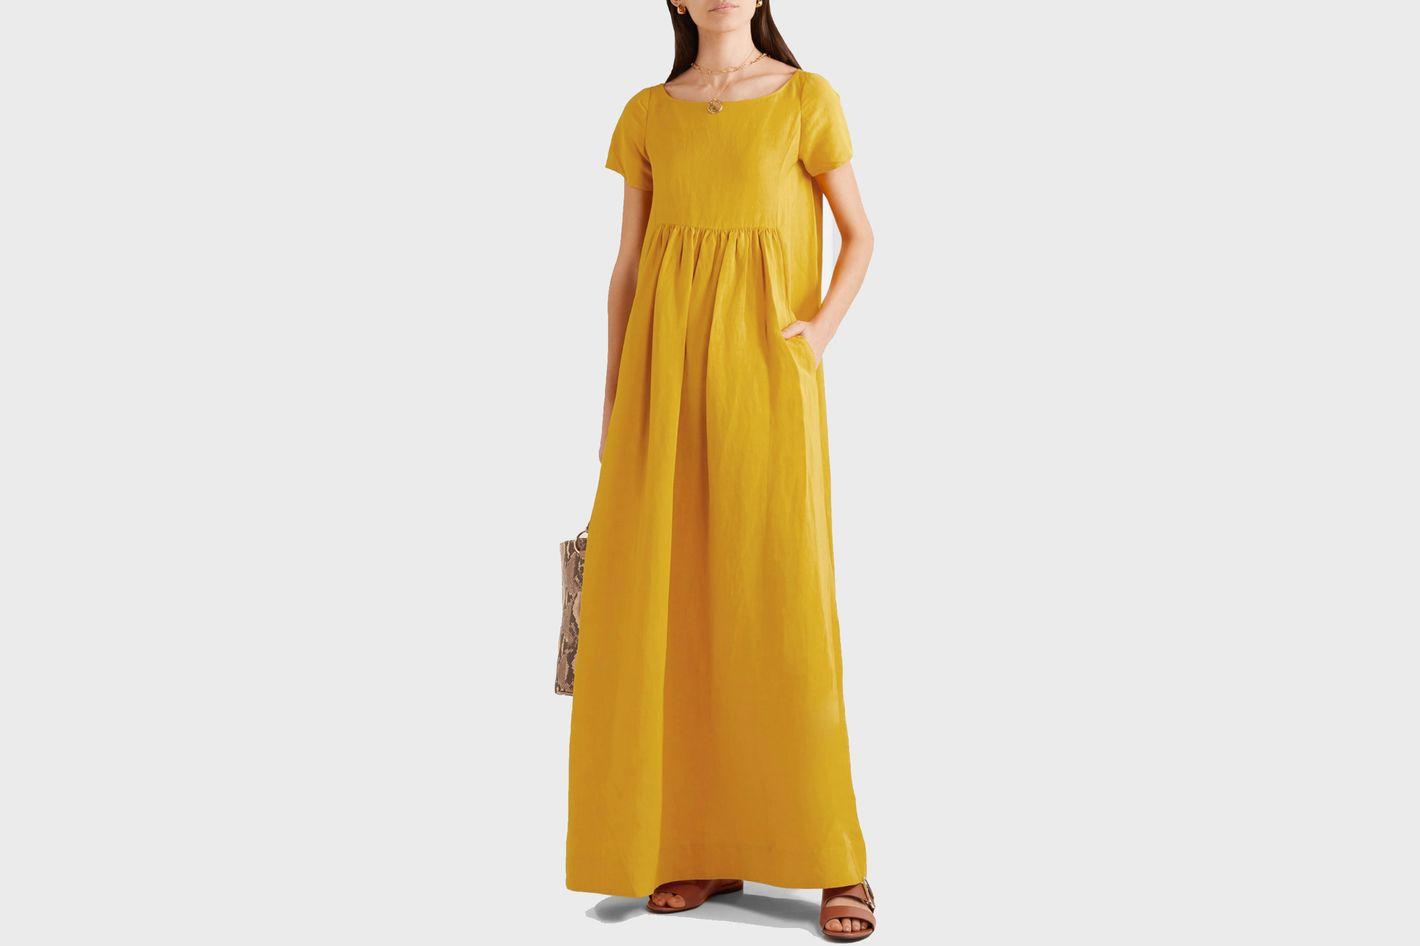 Co Oversized Woven Dress